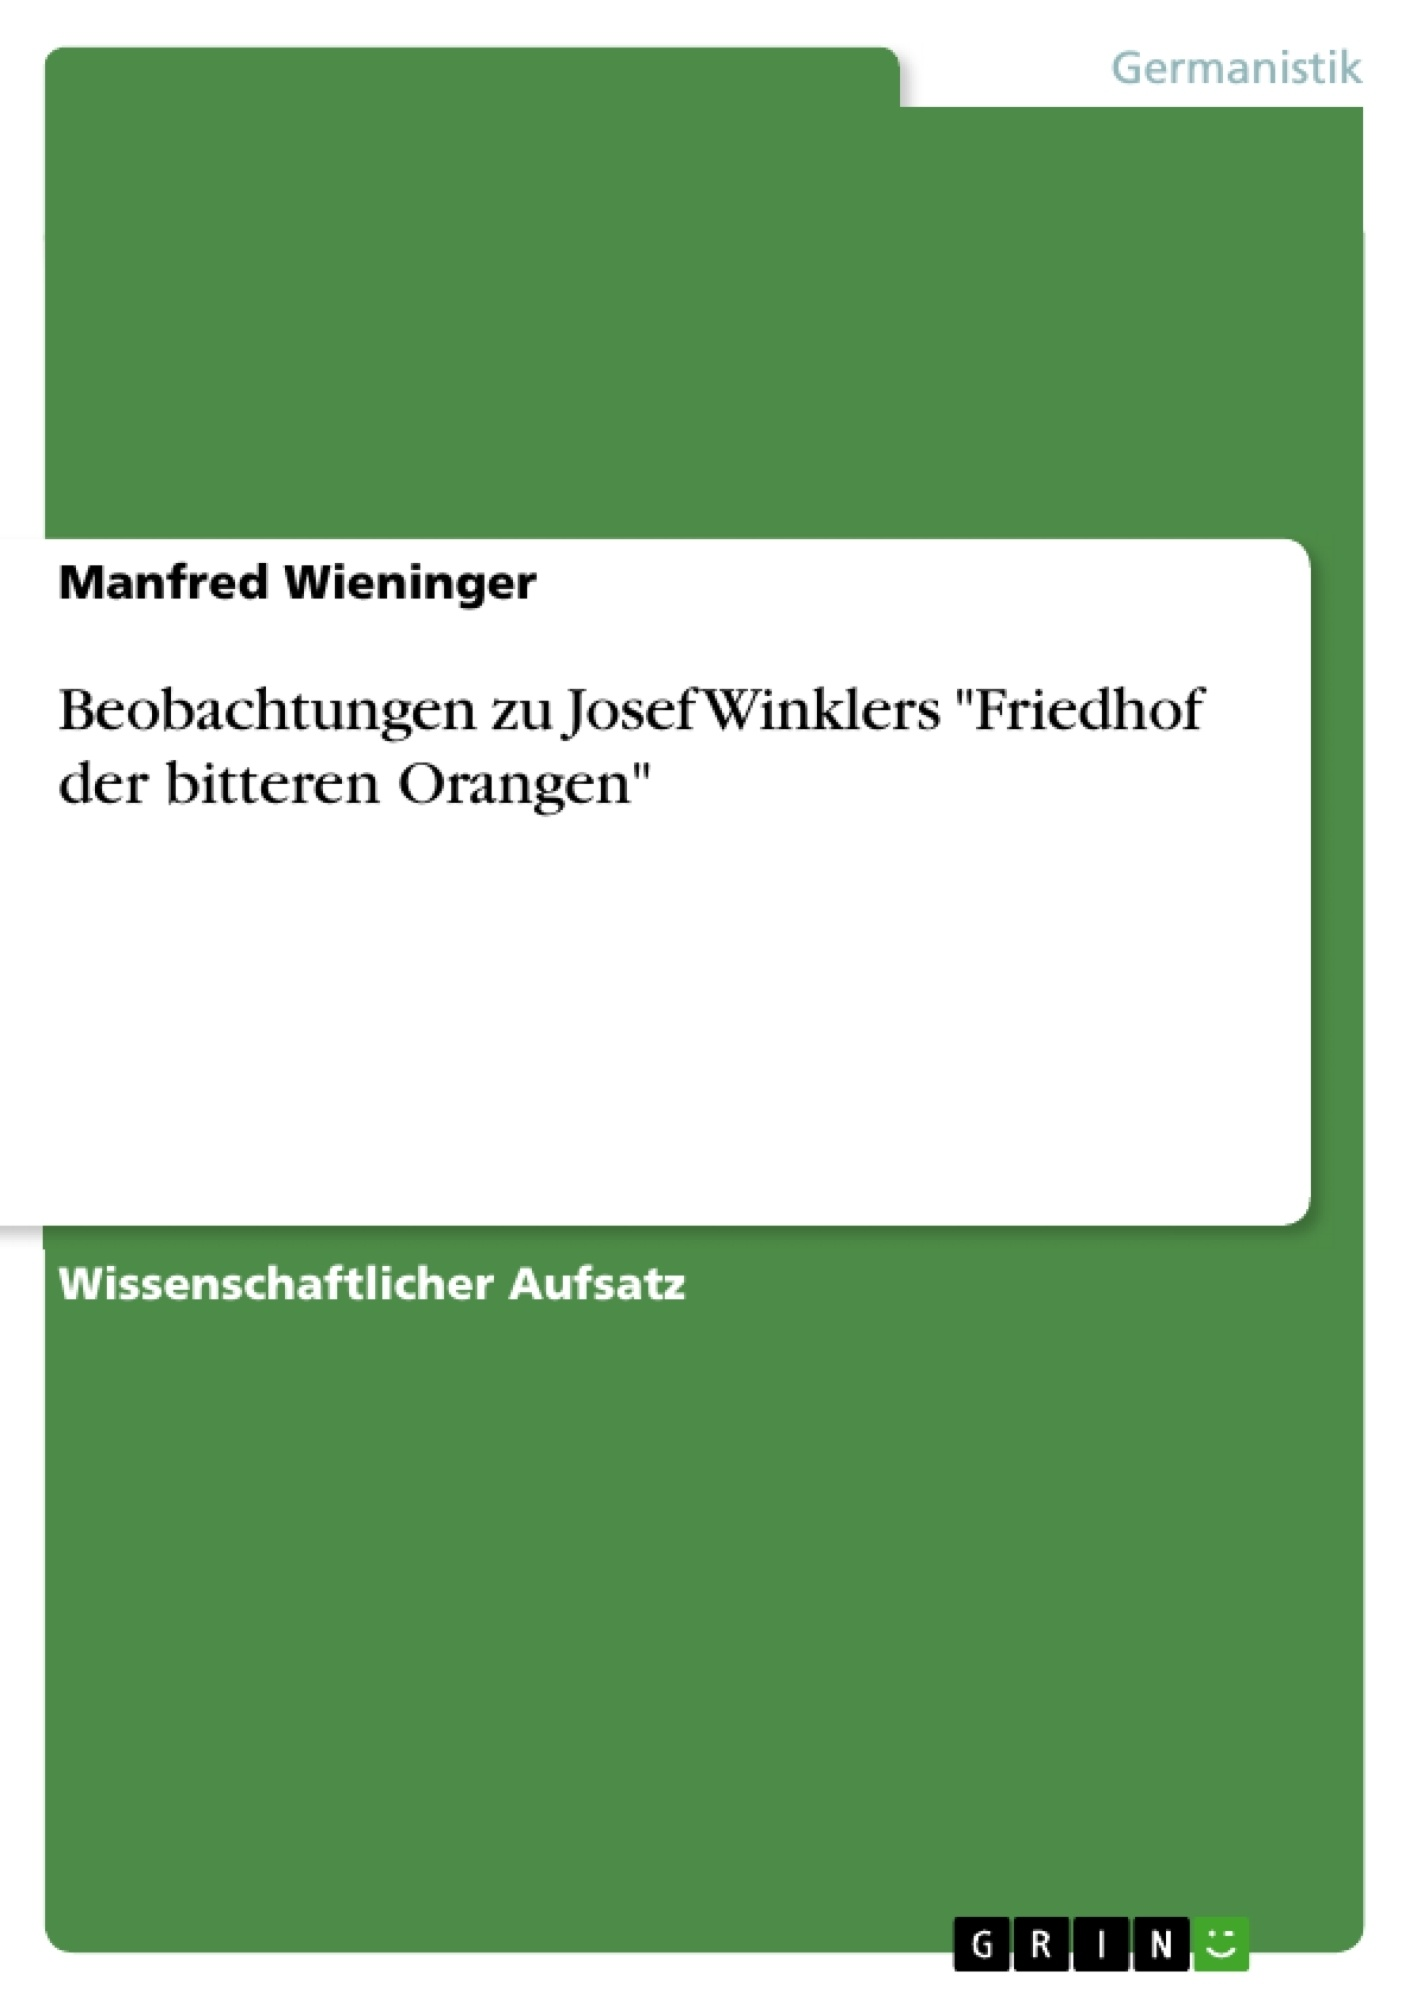 kubricks a clockwork orange essays